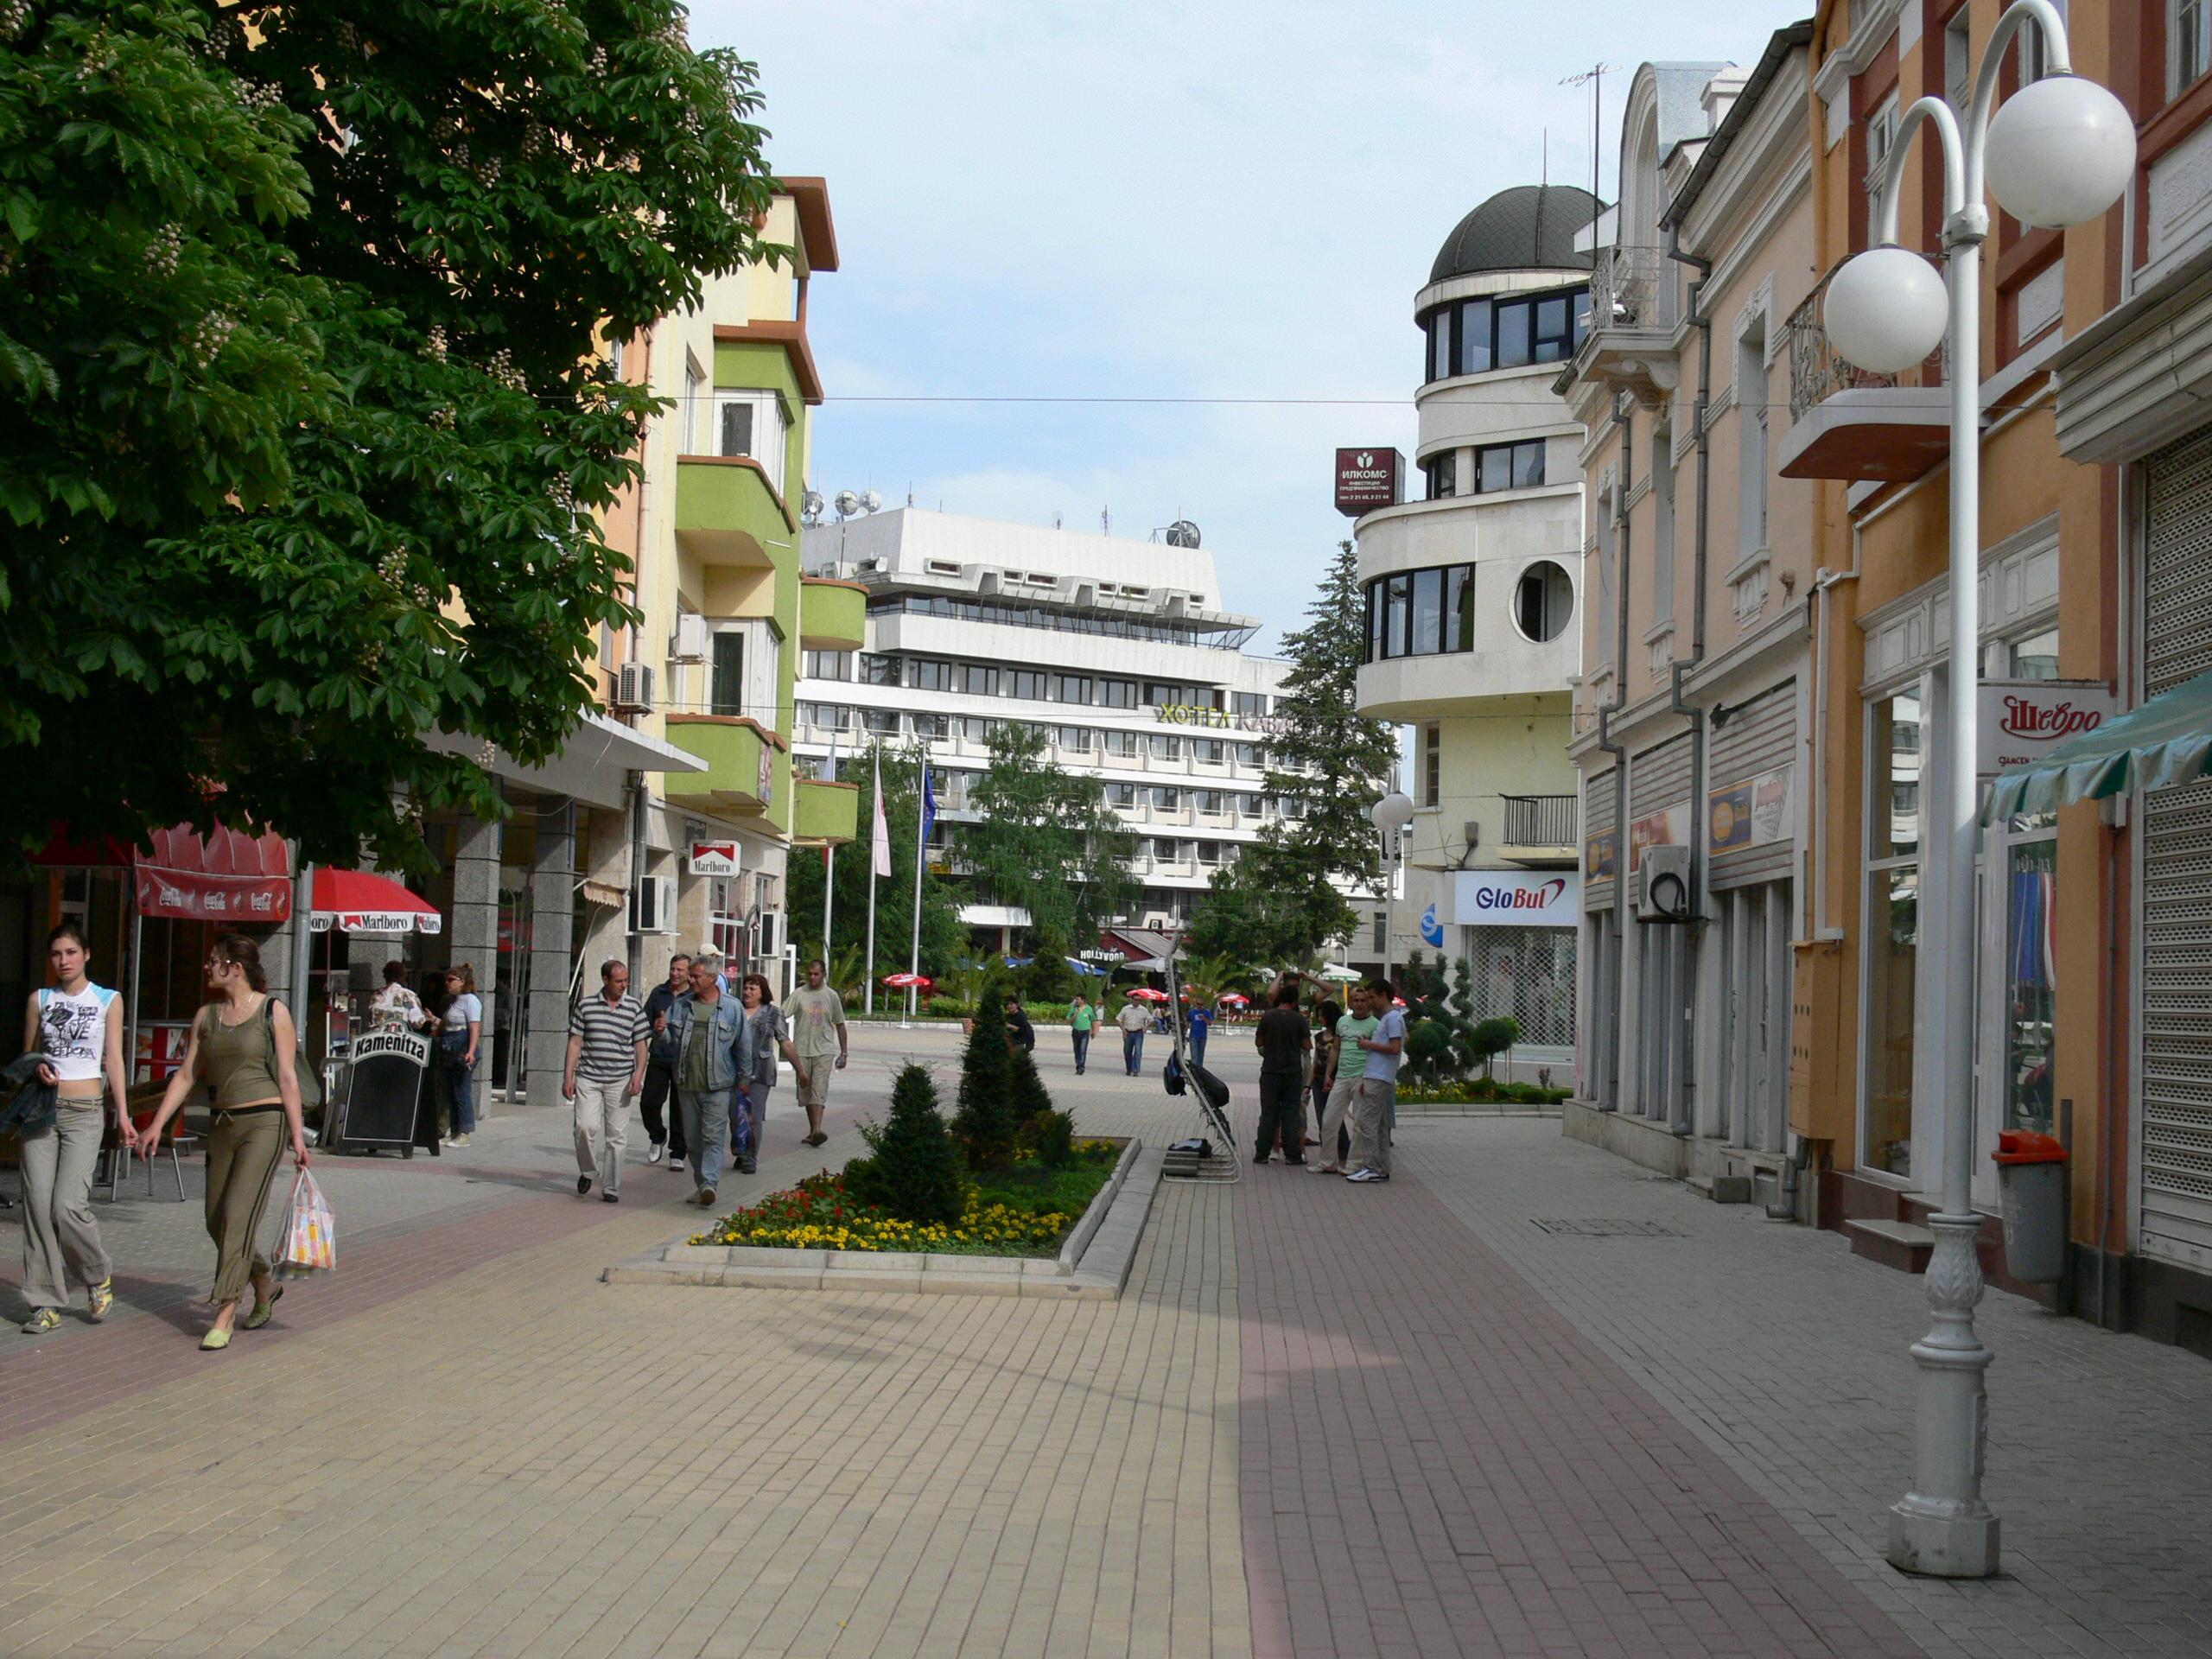 URGENTE, SVE Bulgaria para jóvenes periodistas